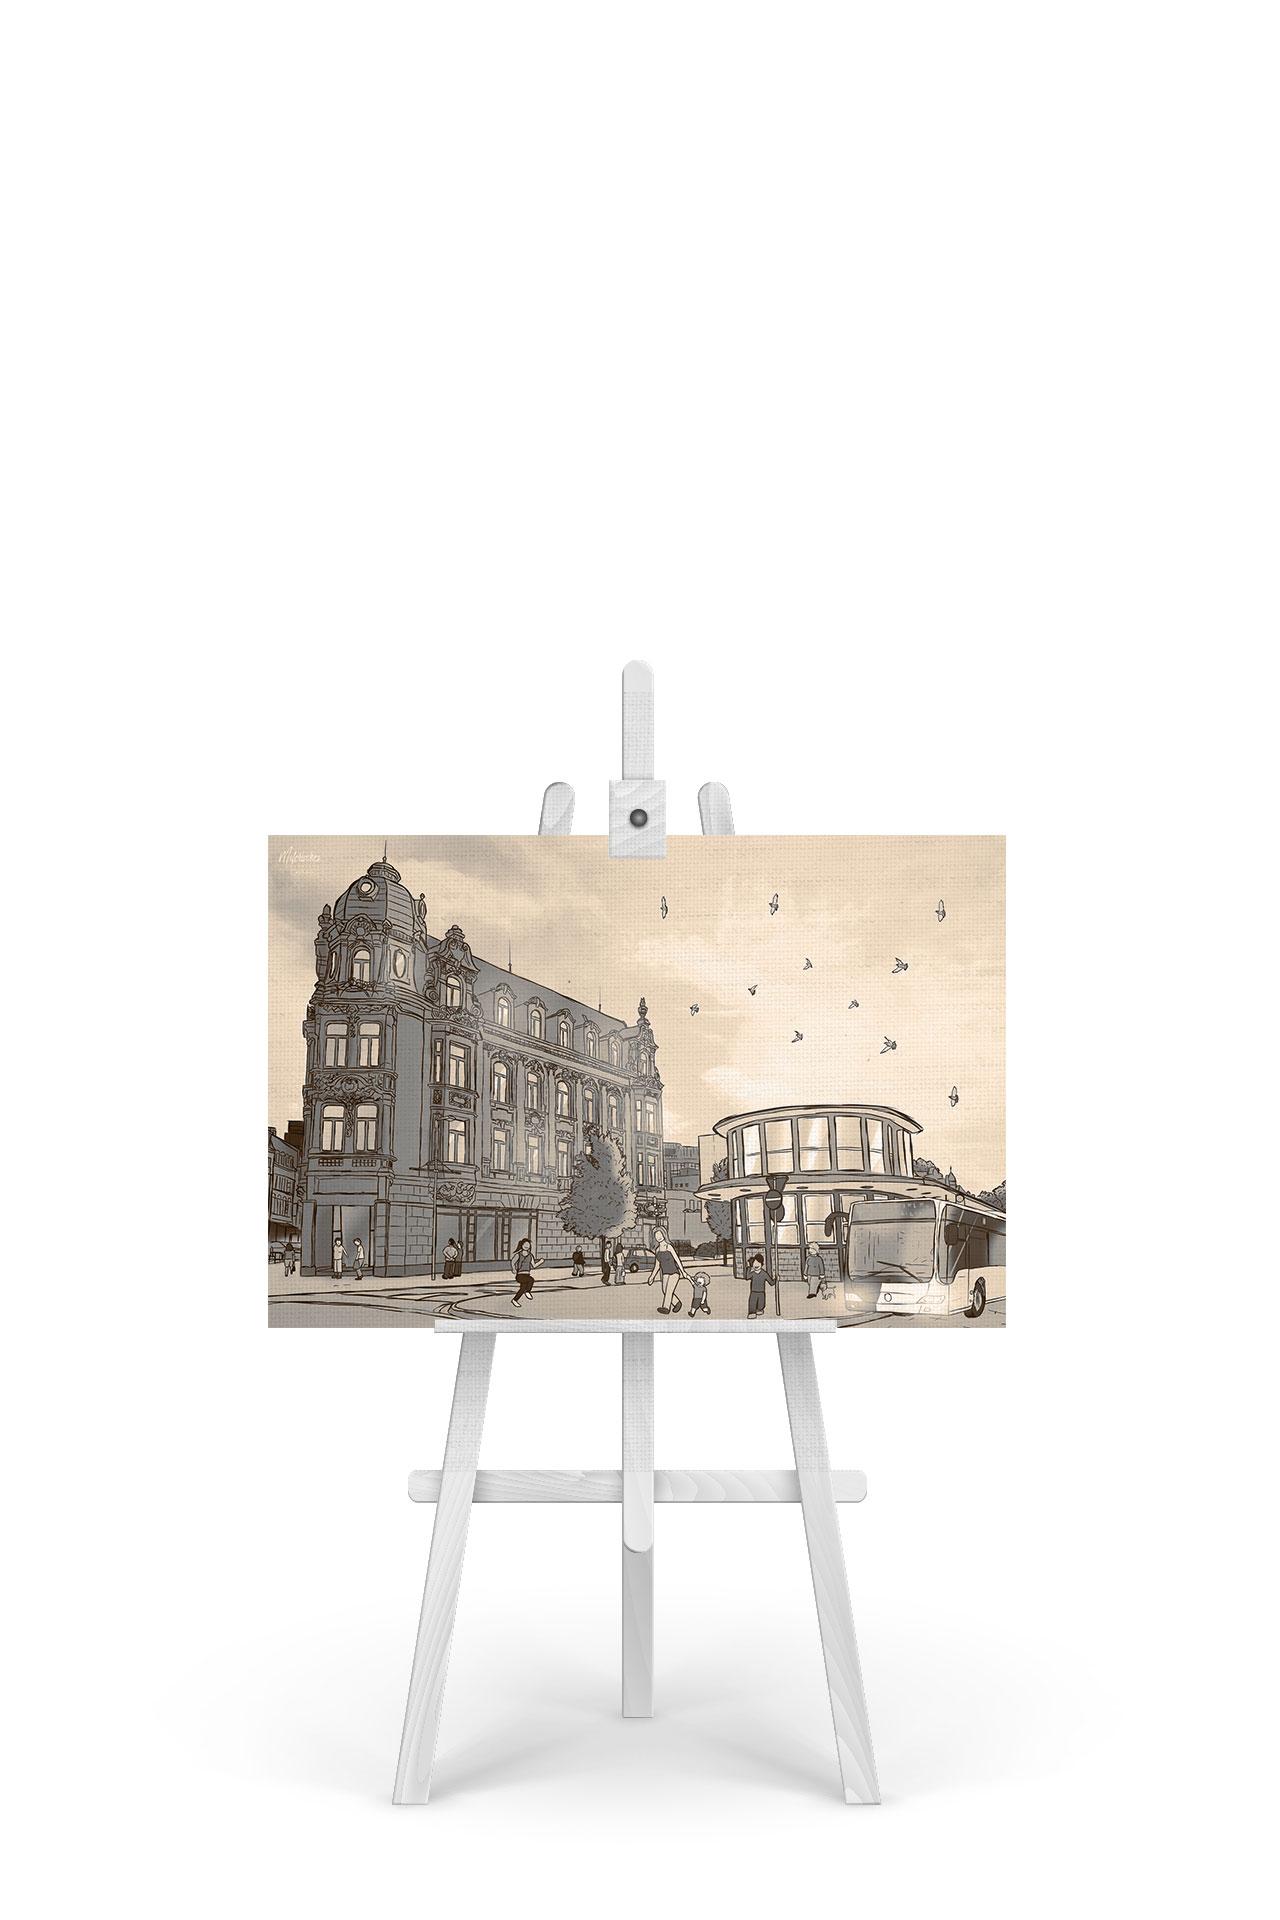 Gemälde Busbahnhof Sepia-Edition